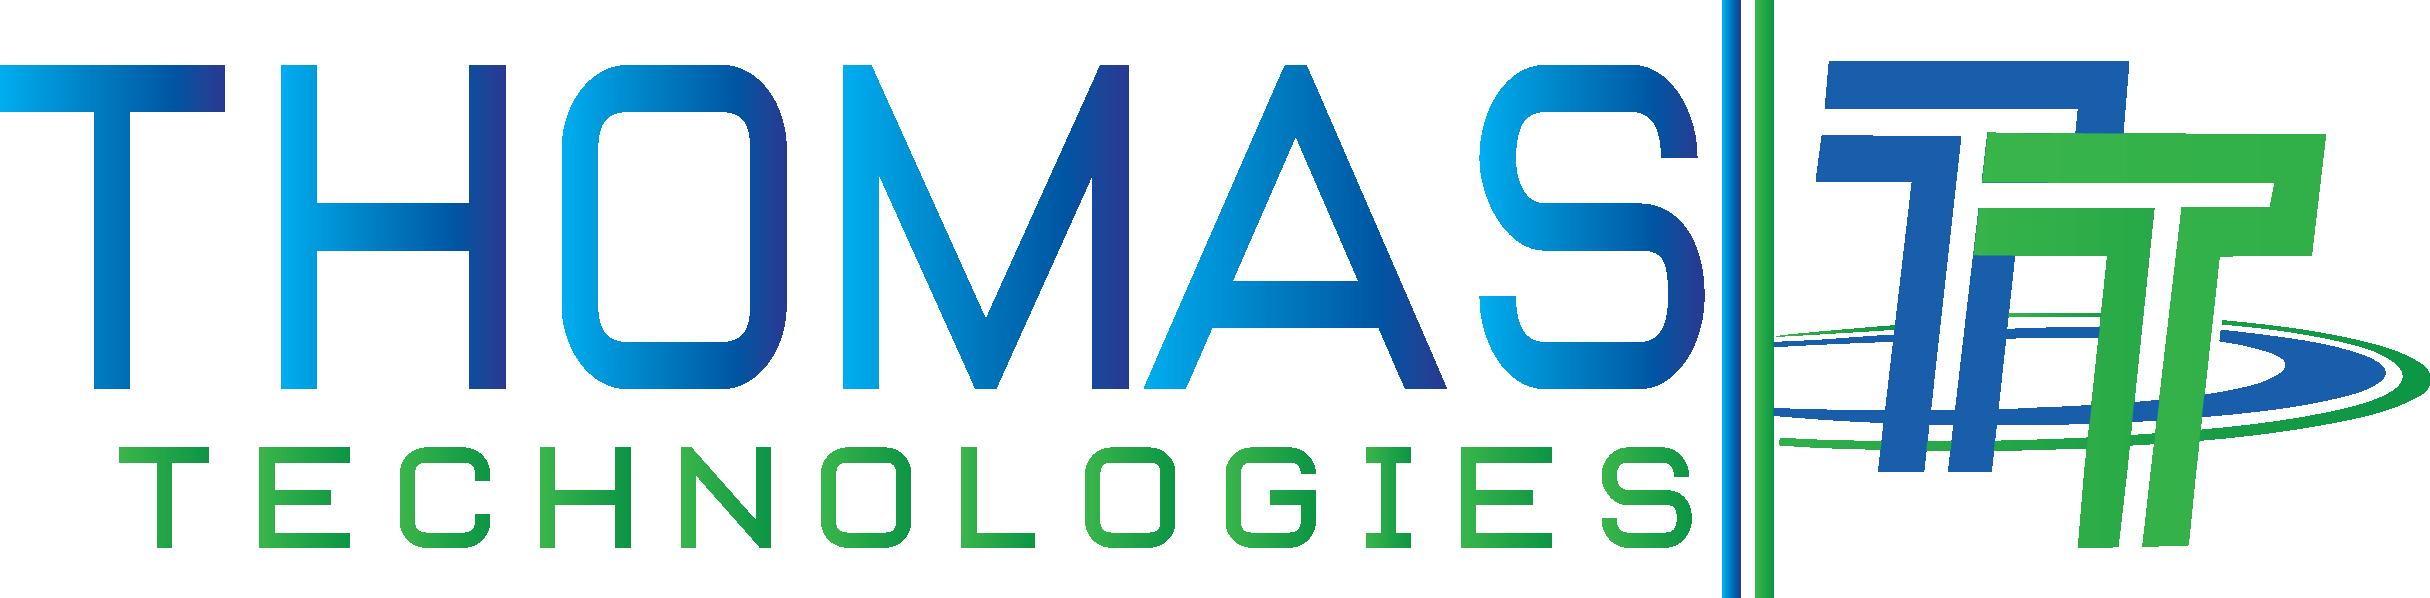 Thomas Technologies LLC